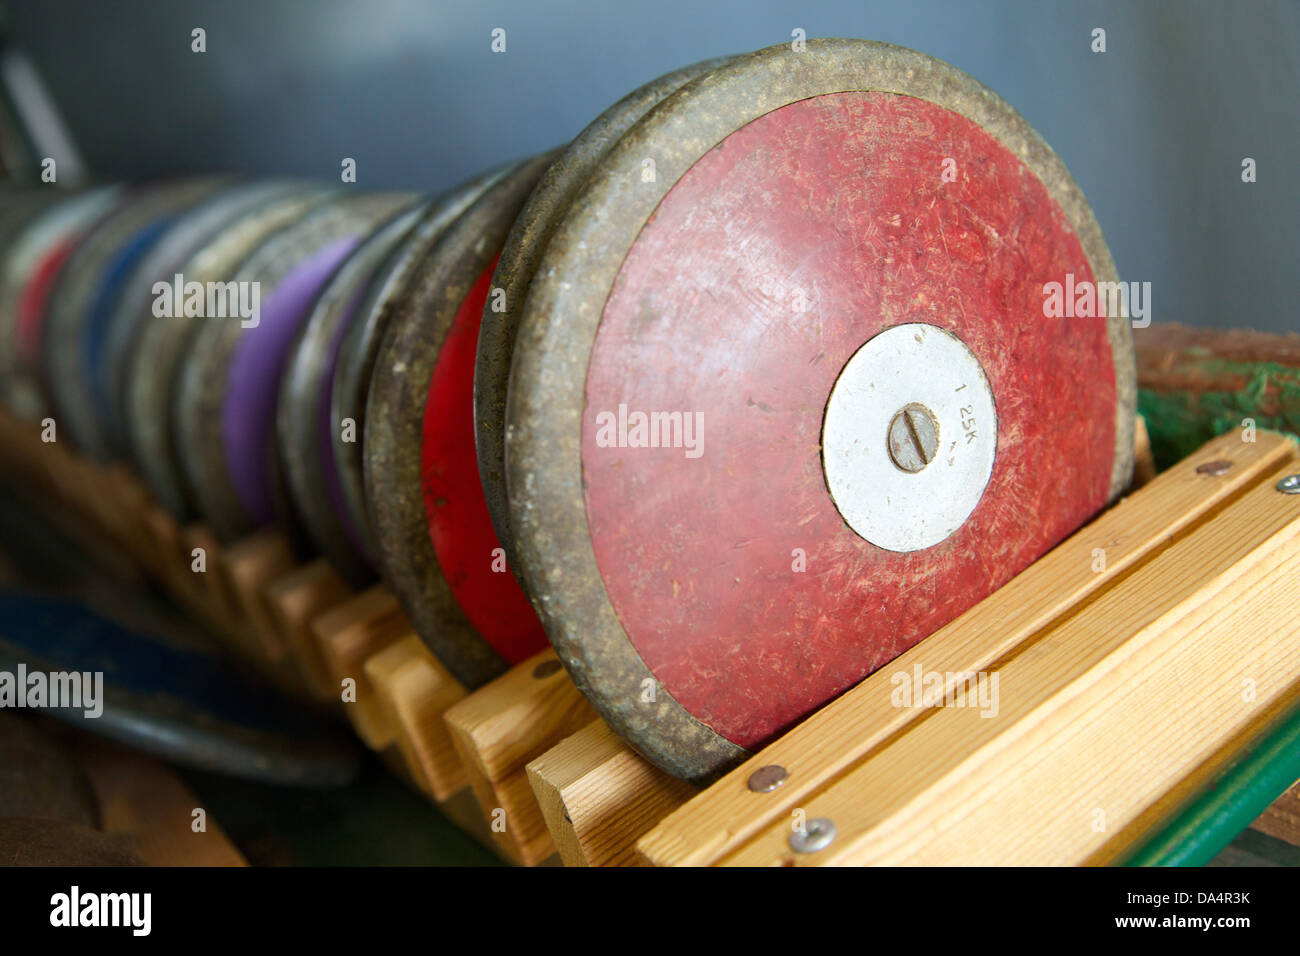 A discus rack of athletics equipment - Stock Image